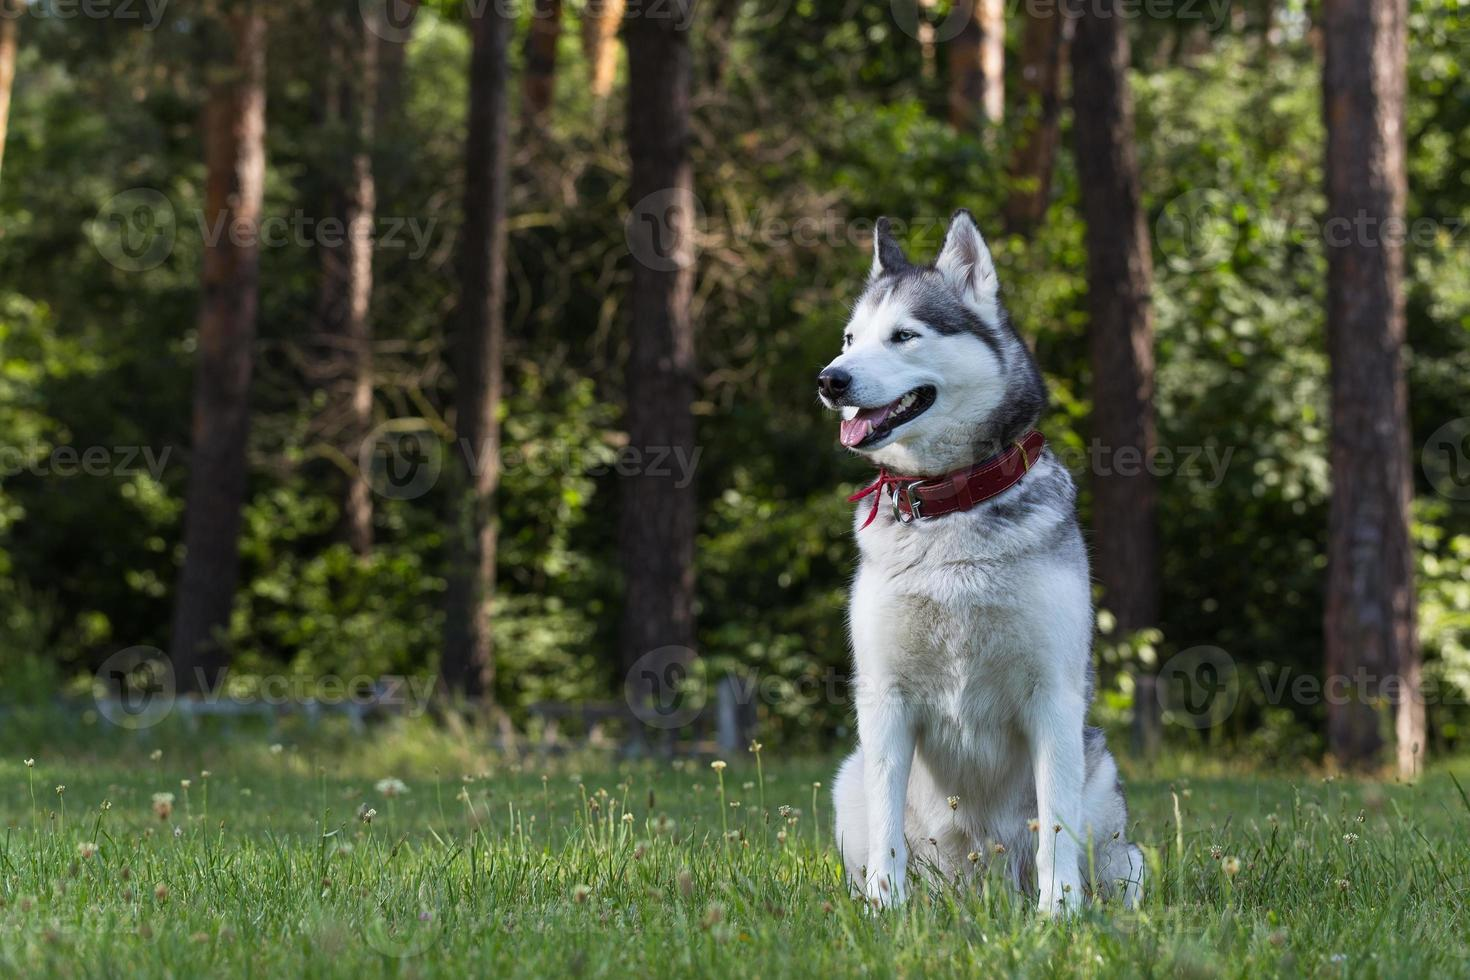 husky siberiano se sienta a la sombra. foto